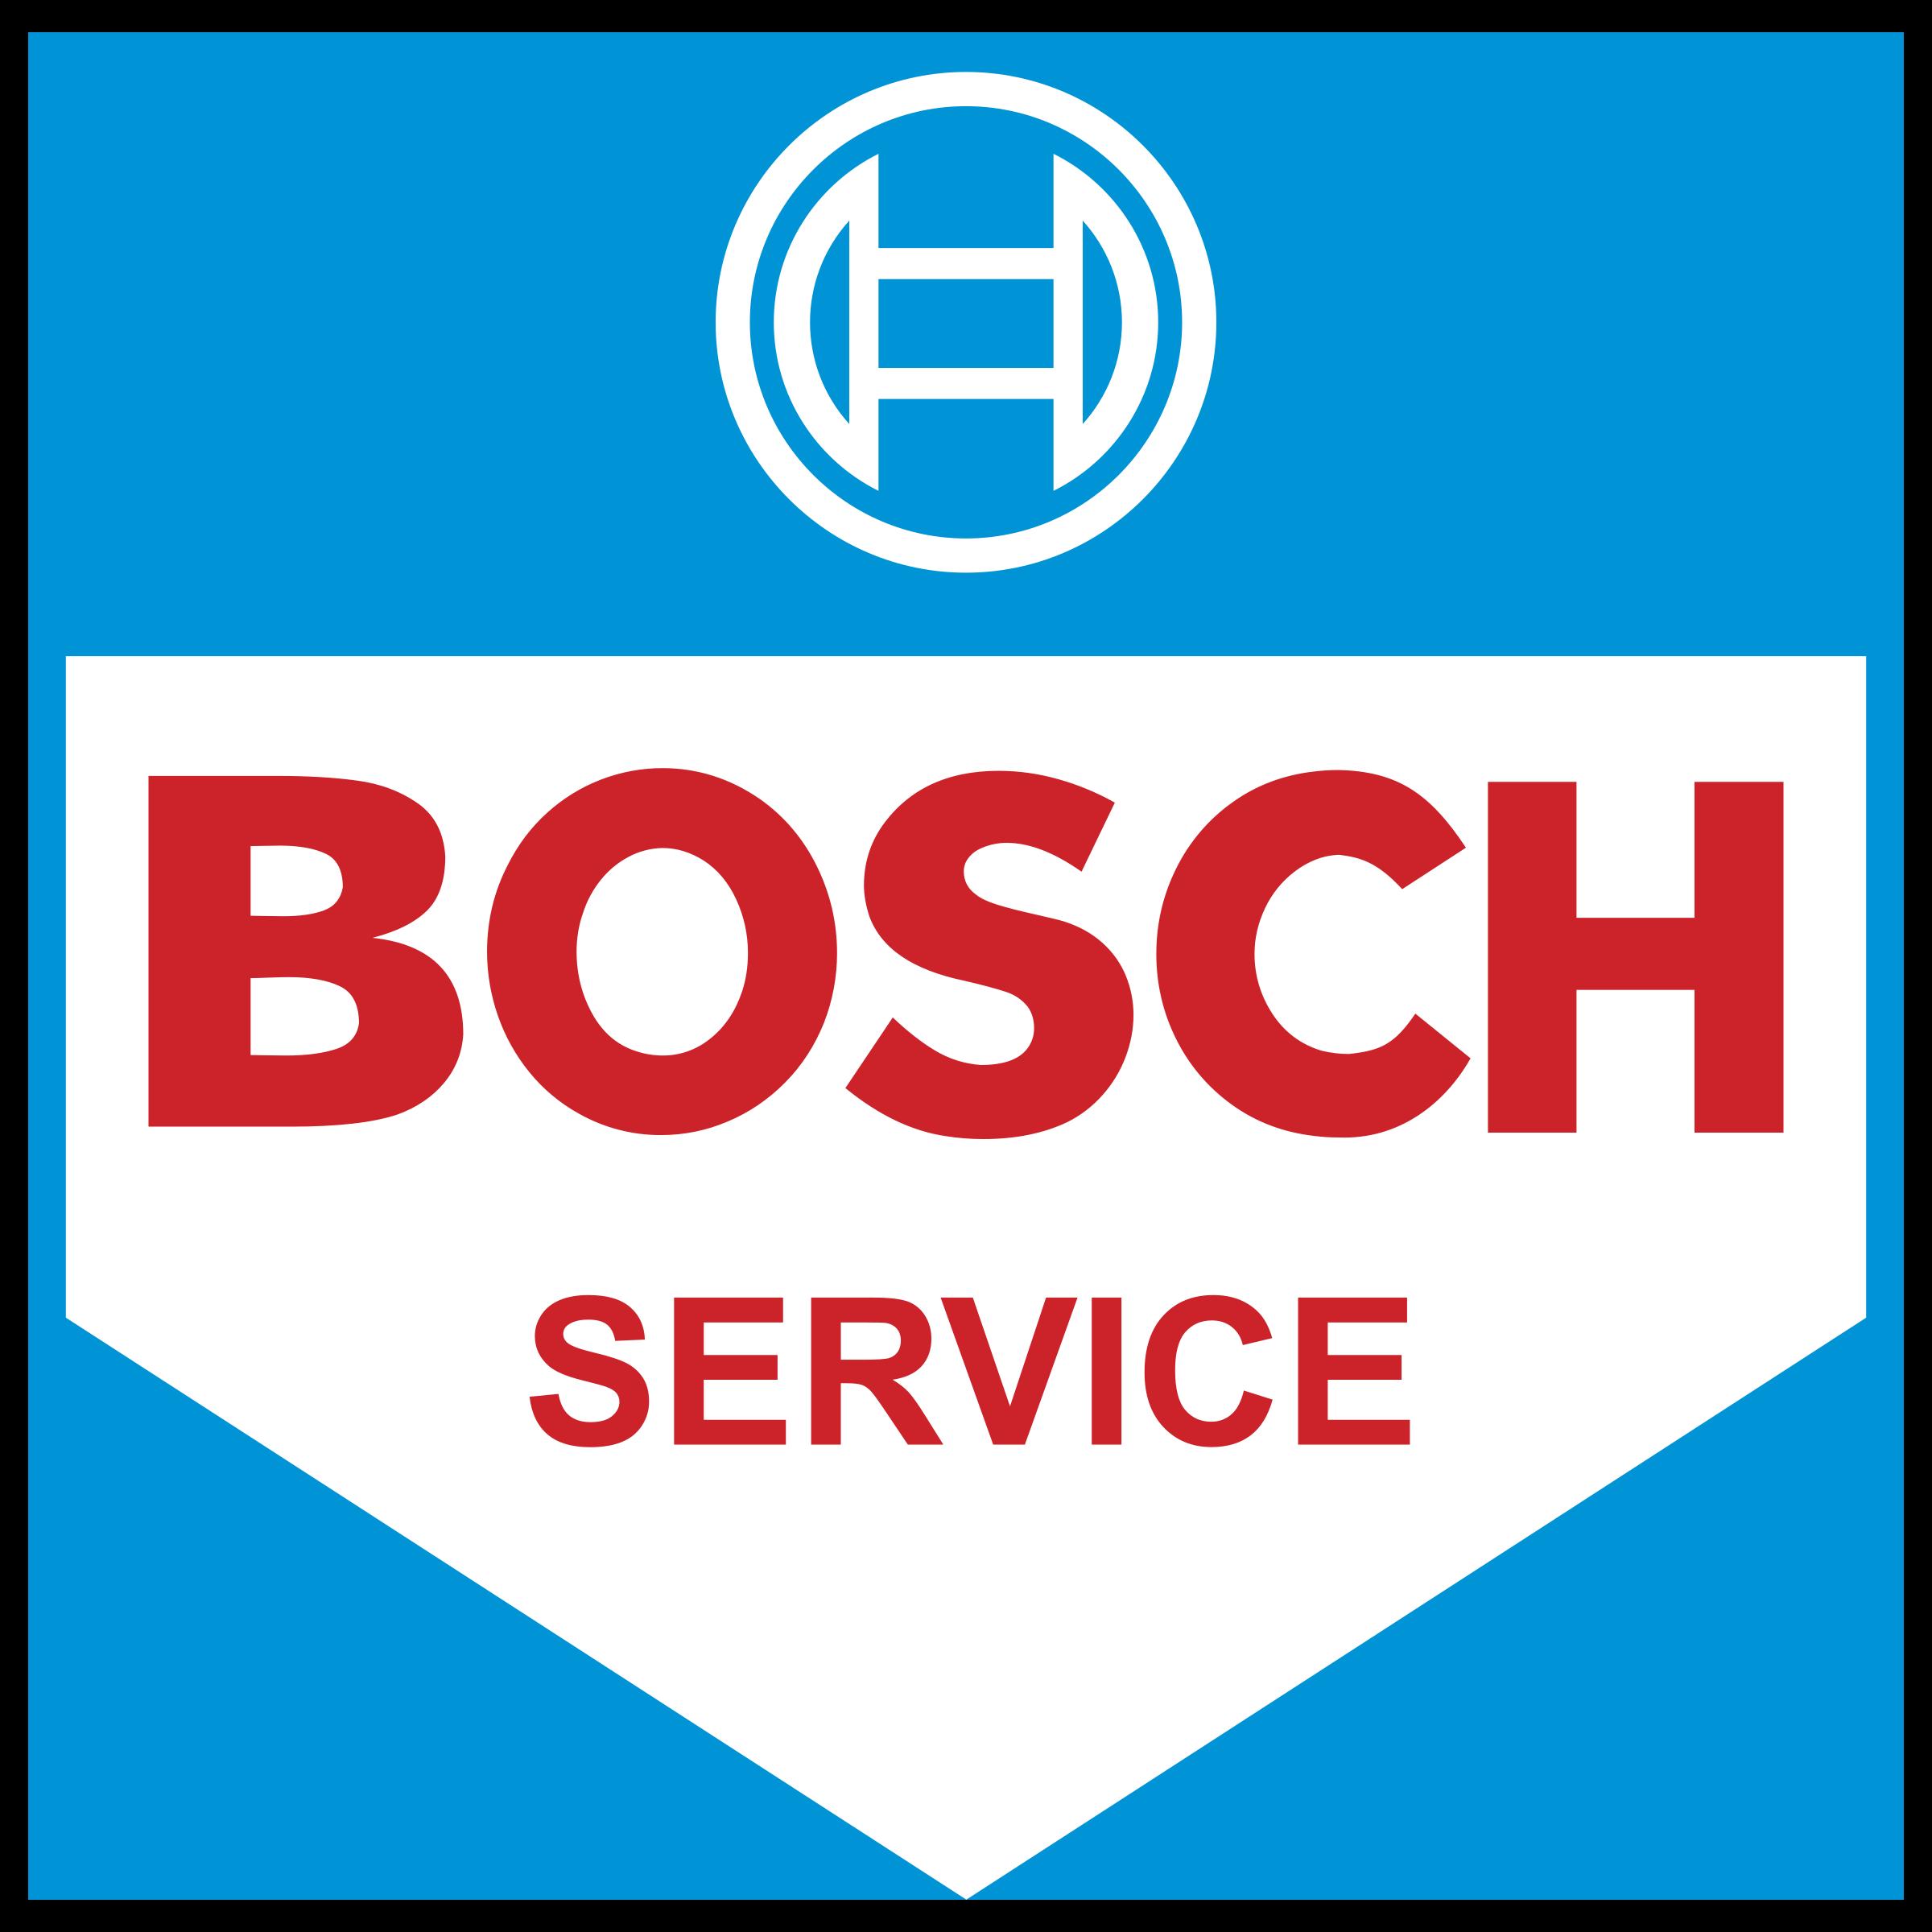 bosch service logo png transparent amp svg vector freebie